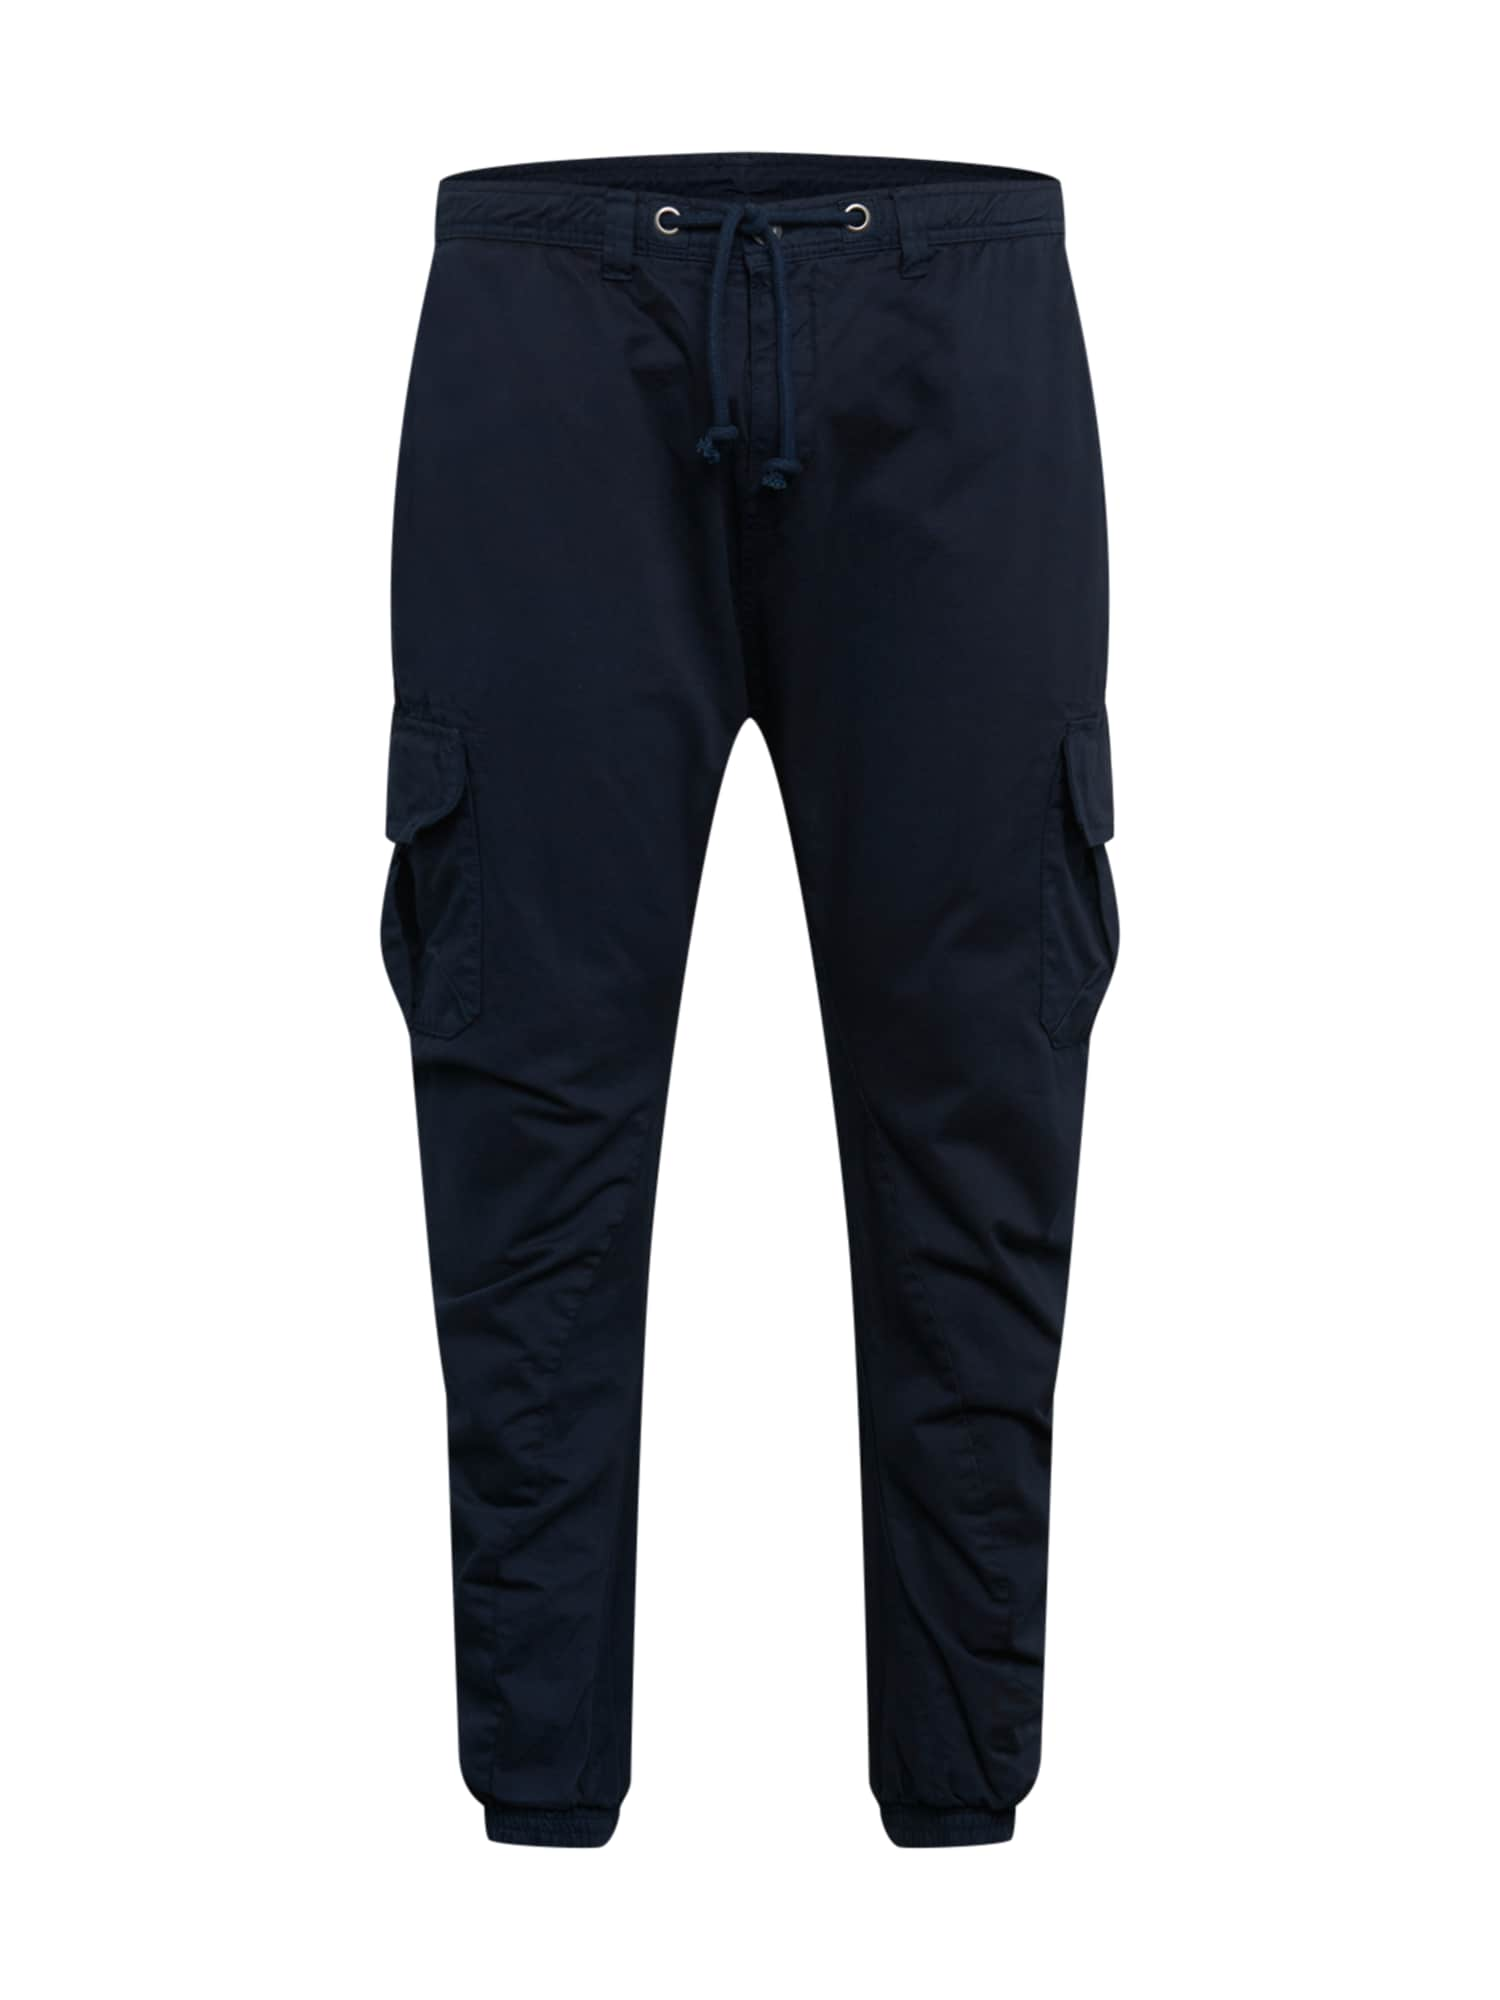 Urban Classics Big & Tall Laisvo stiliaus kelnės tamsiai mėlyna